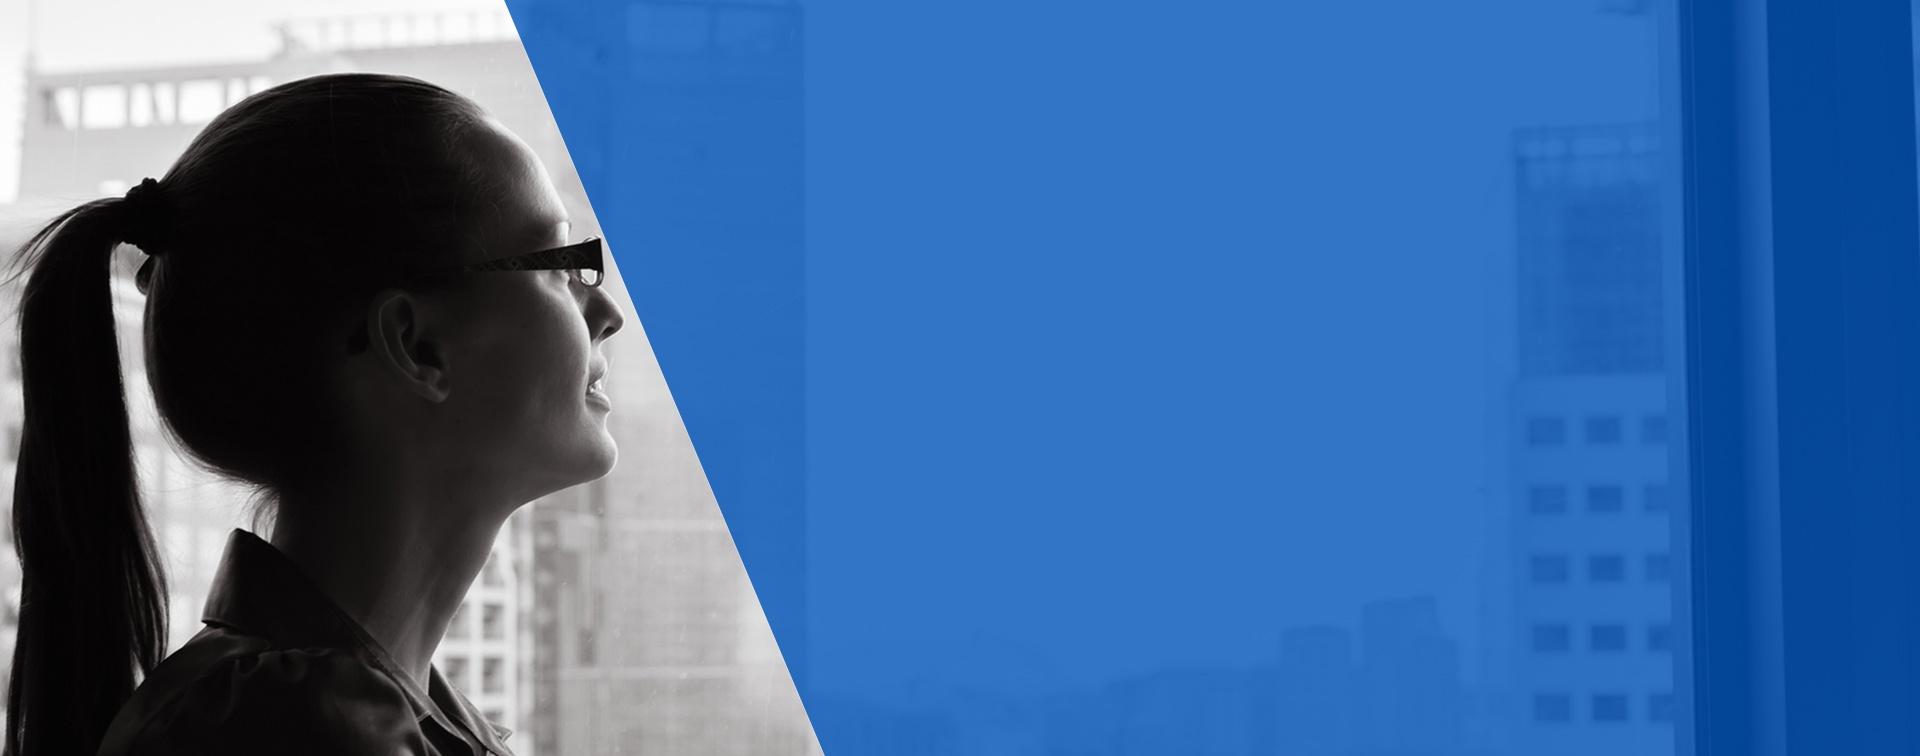 thinkinggirl-blue.jpg